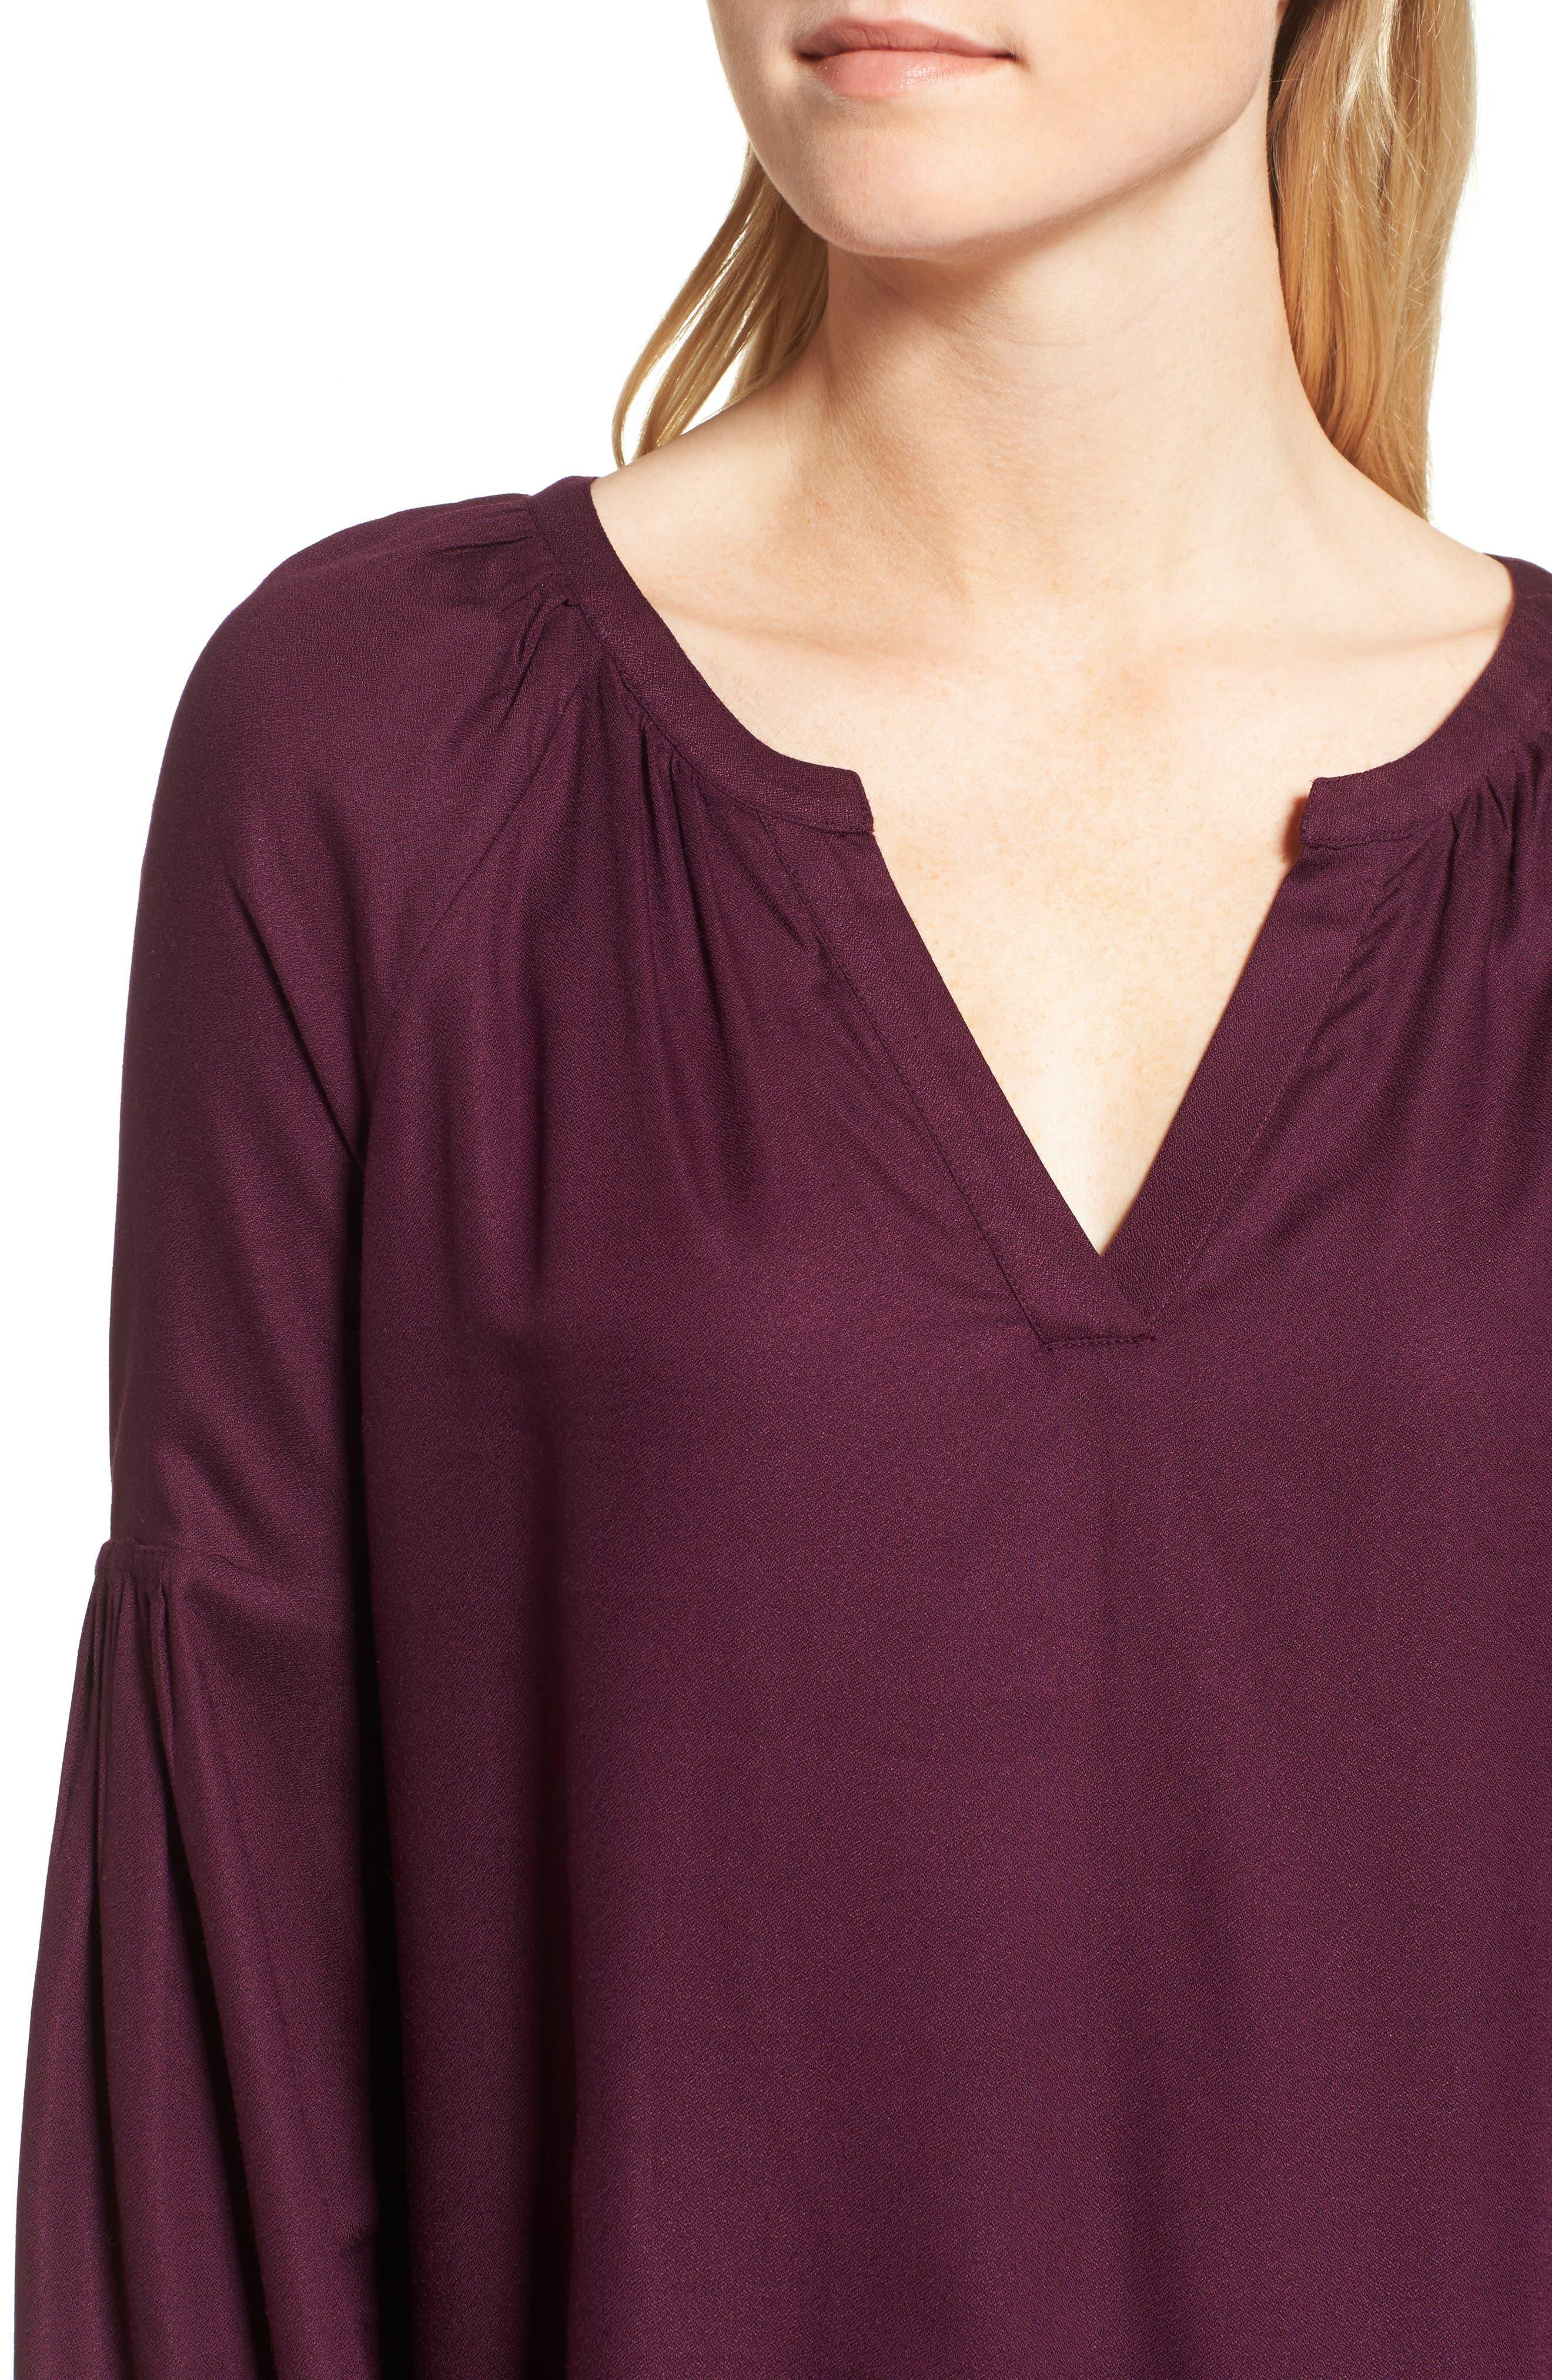 Blouson Sleeve Top,                             Alternate thumbnail 4, color,                             Purple Potent